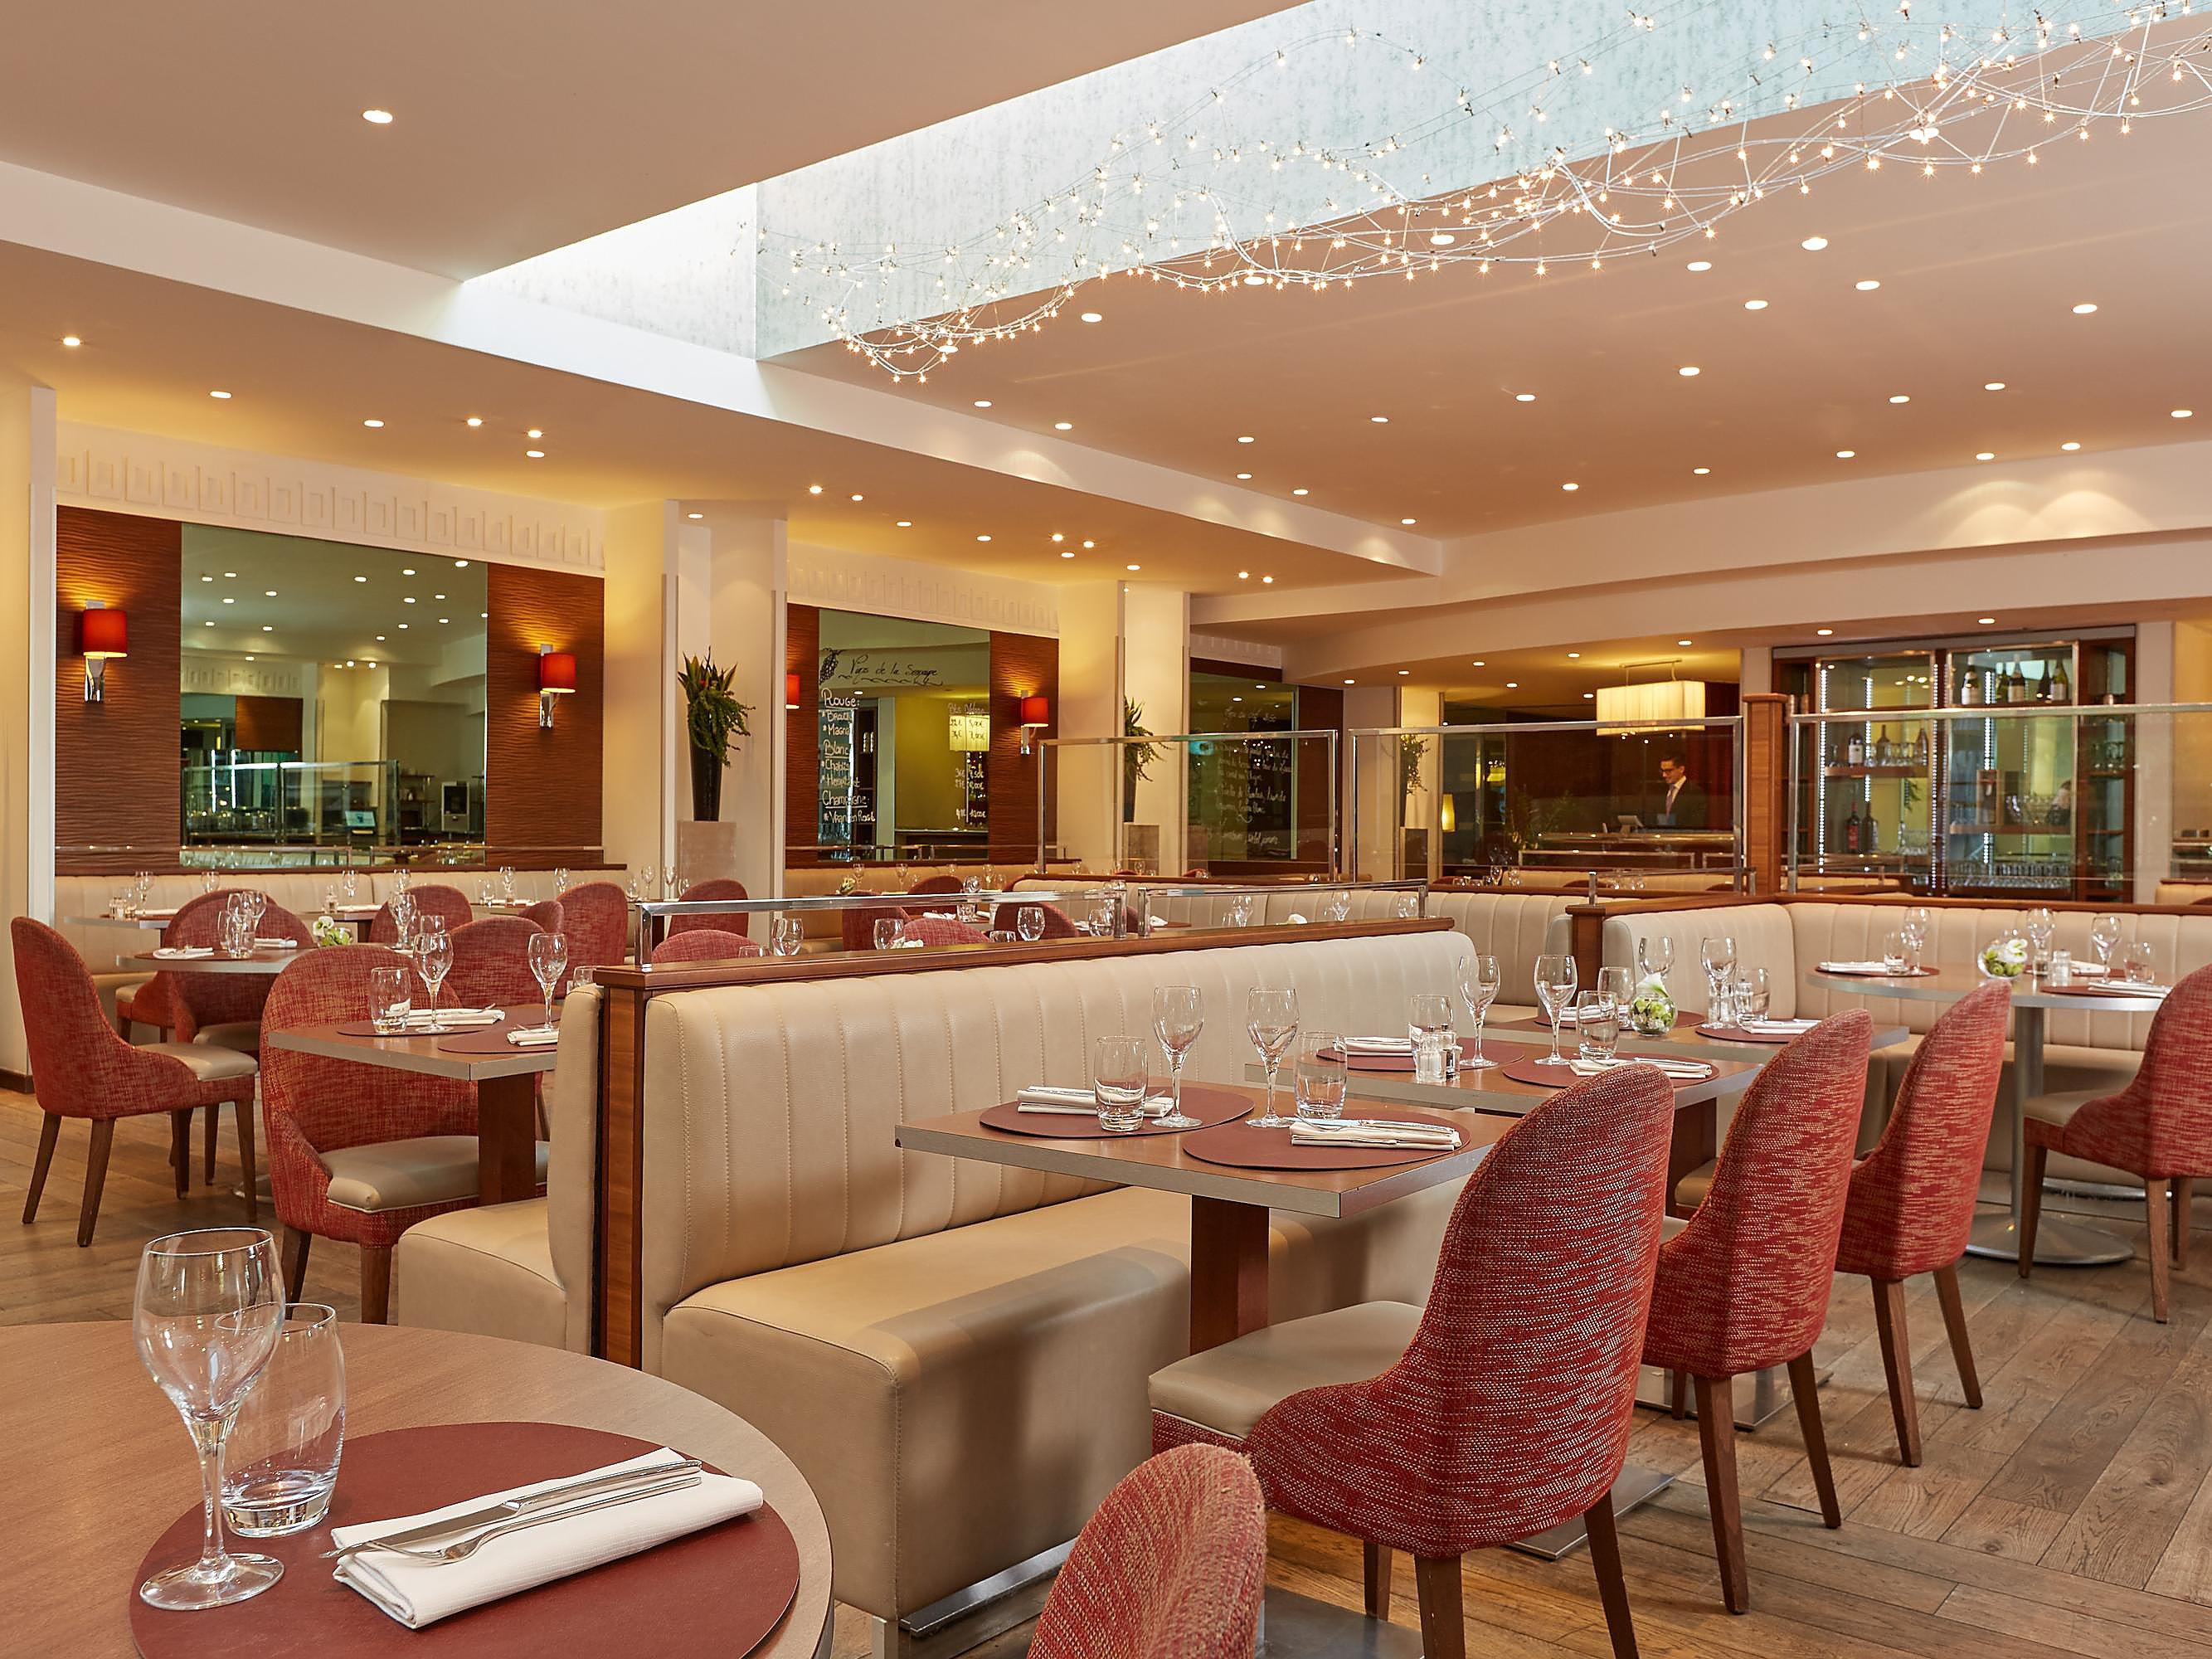 Magny Le Hongre Restaurant restaurants near roissy-en-france - crowne plaza